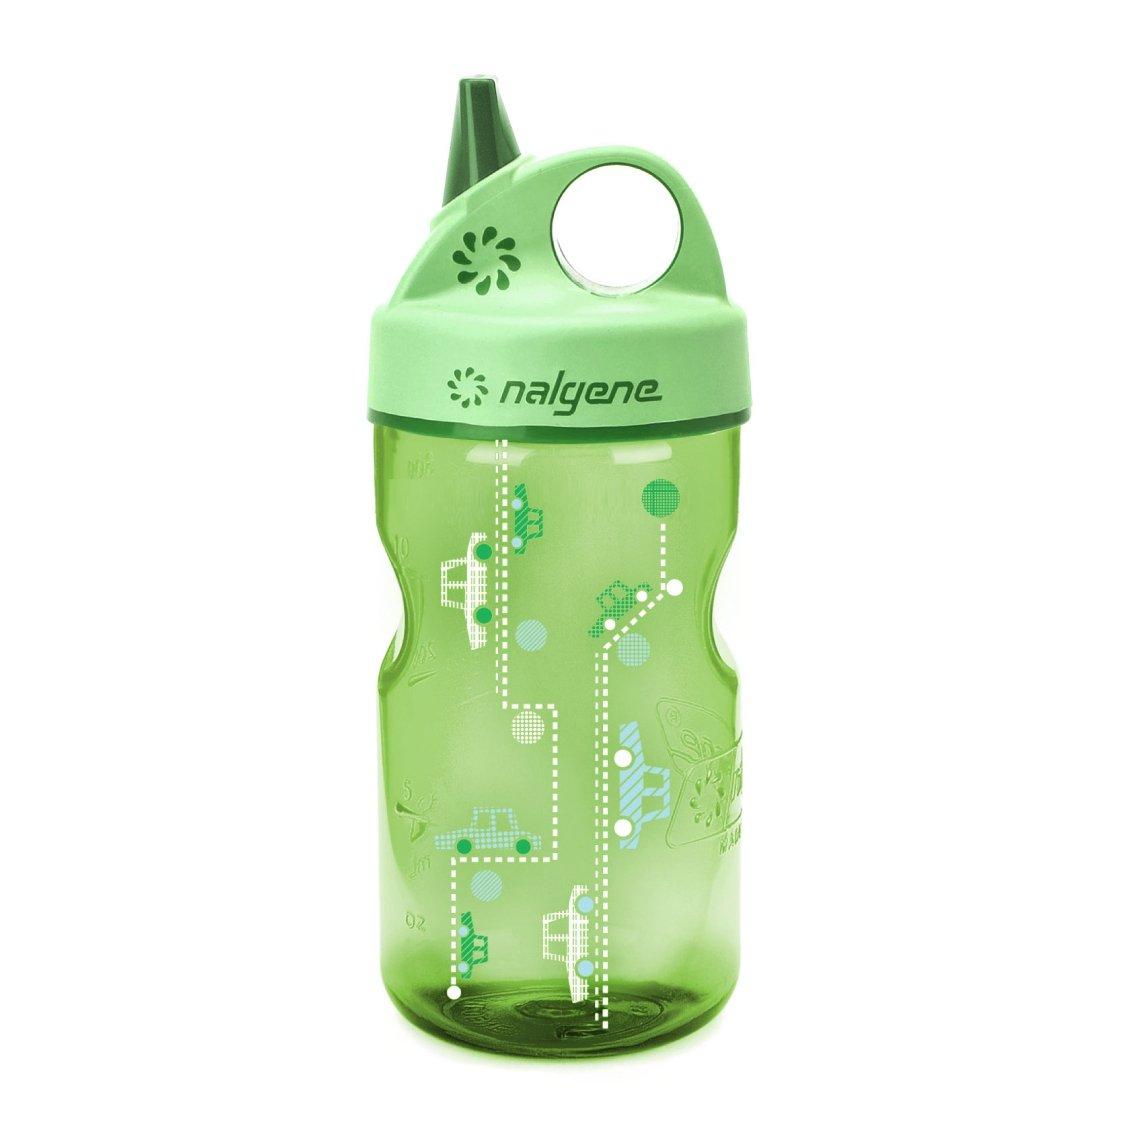 Nalgene 'Everyday Grip de N- Gulp' –  0,35 l, verde, diseñ o de coches 35l diseño de coches 661195821315